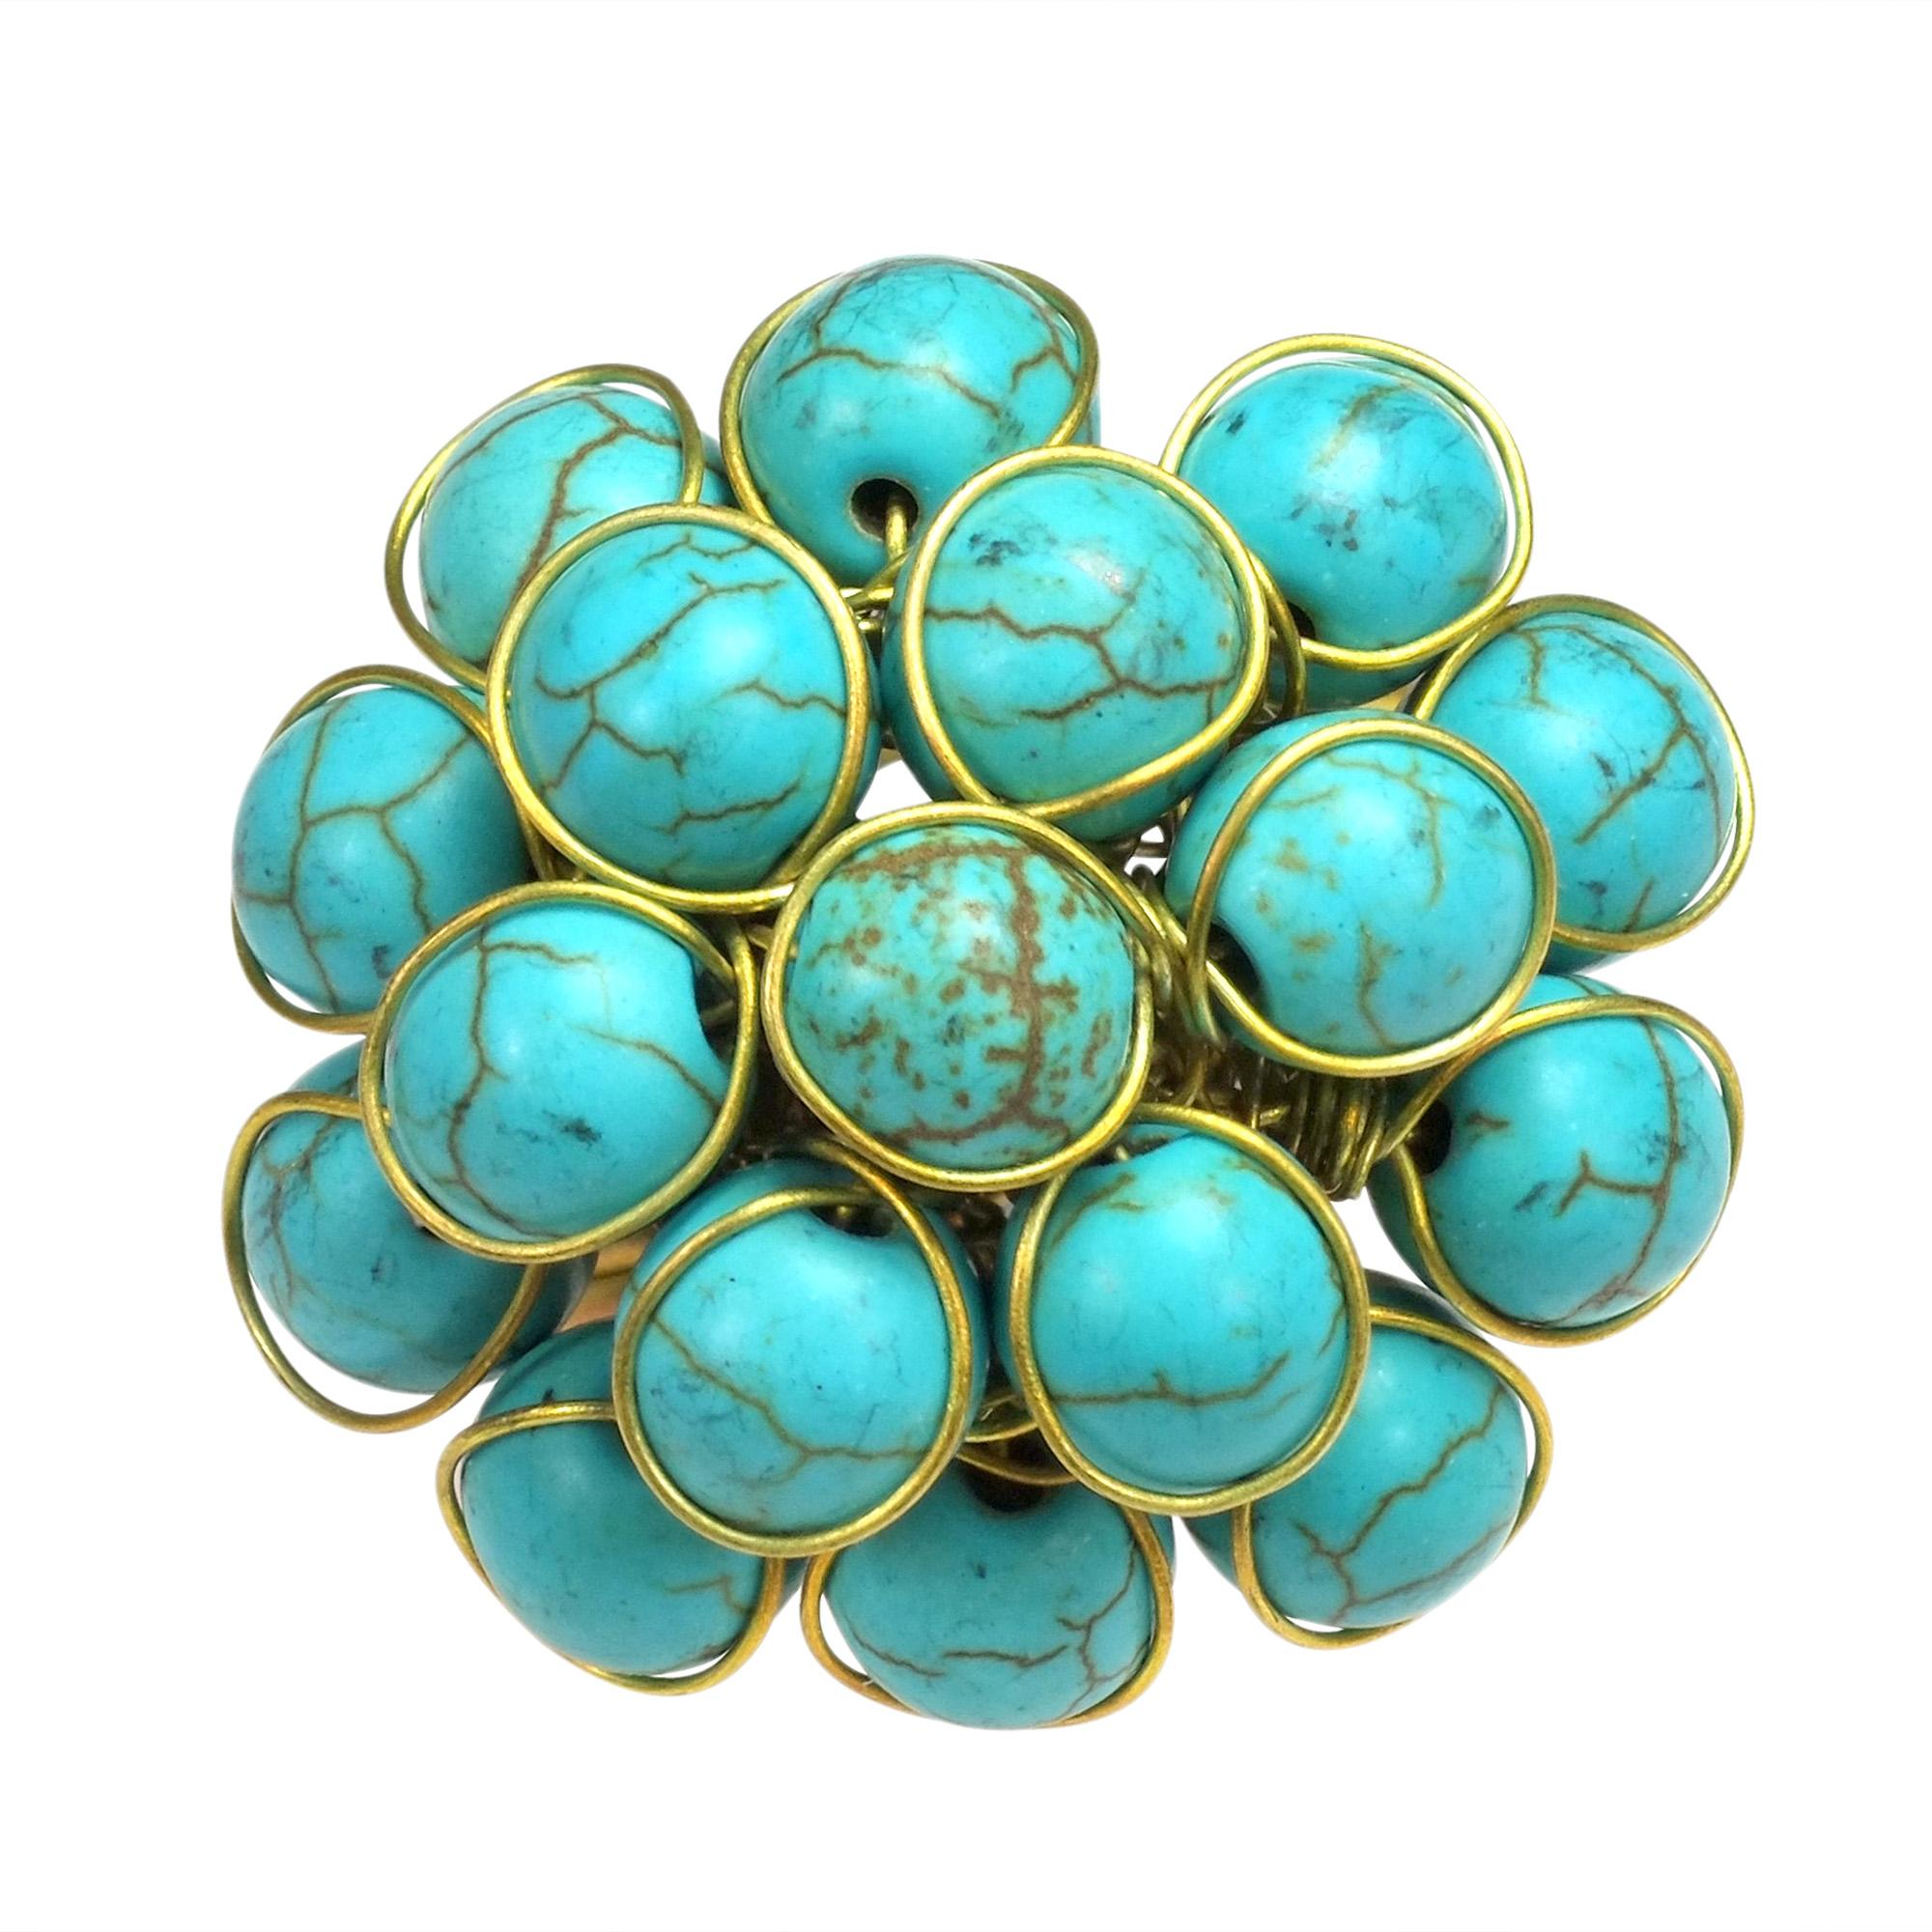 Unique Handmade Front Cluster Blue Stone Organic Ring - AeraVida